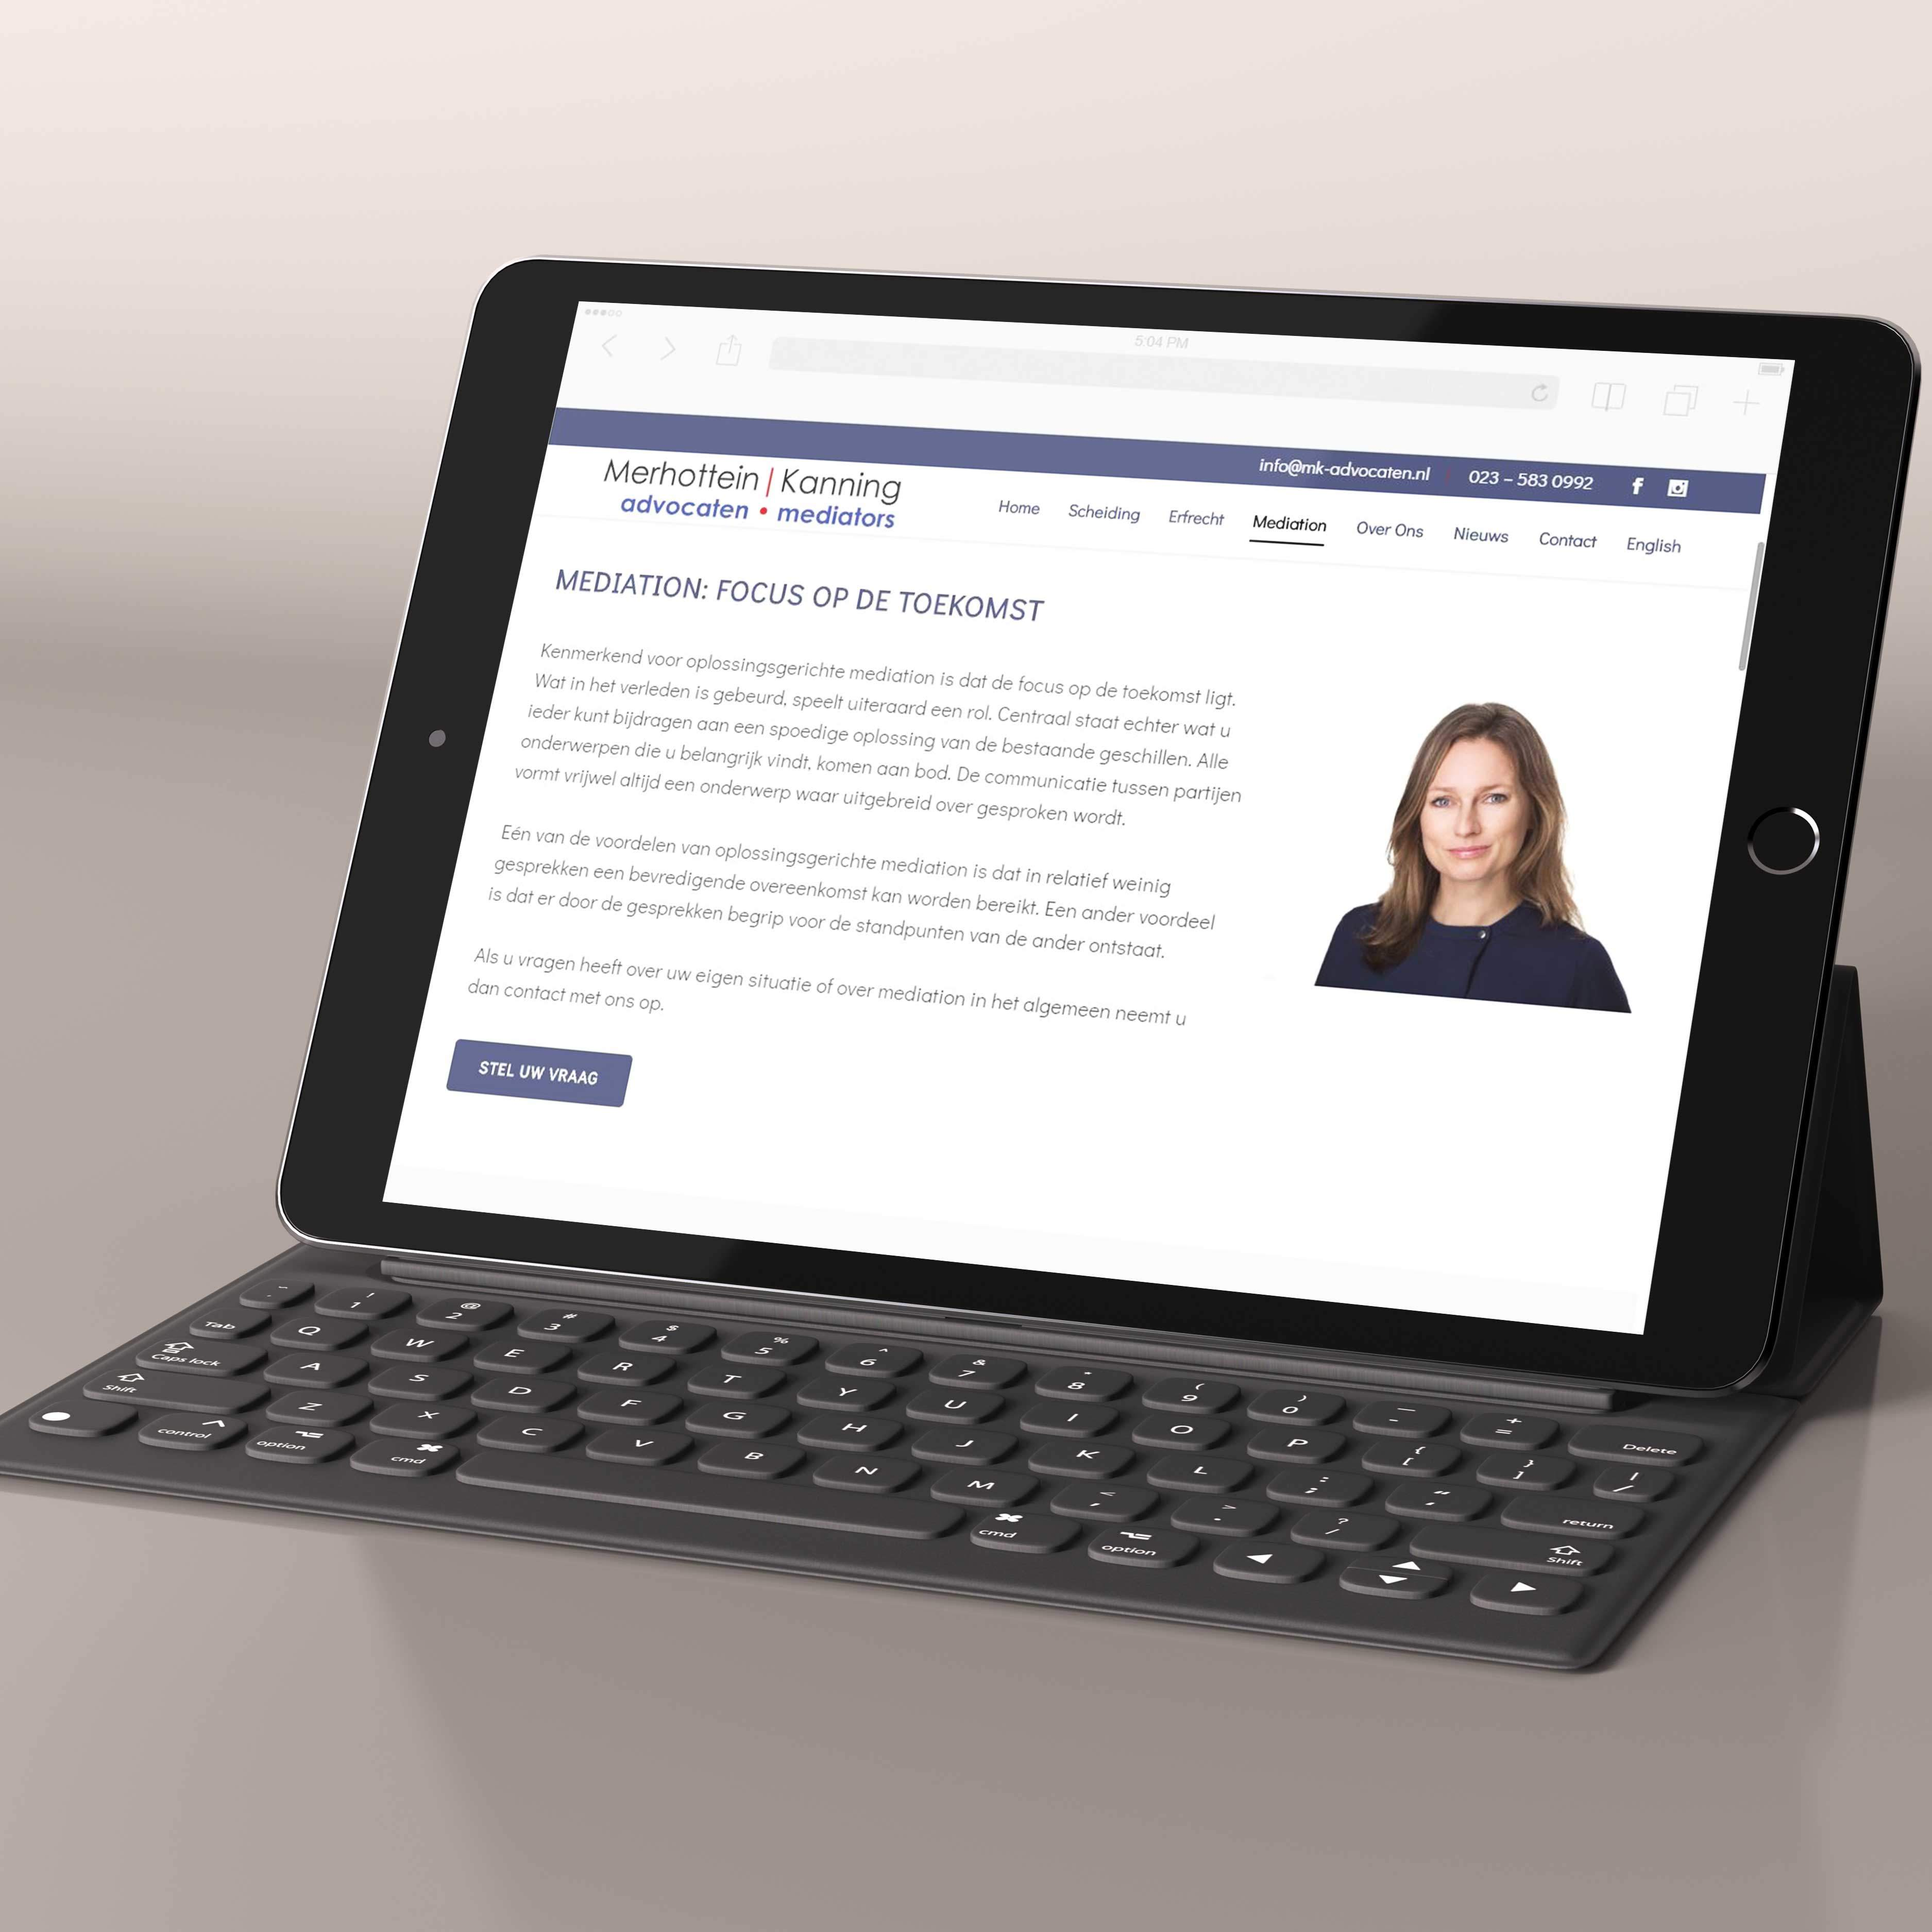 mk-advocaten-online-marketing-bureau-webdevelopment-haarlem-made-marketing-3